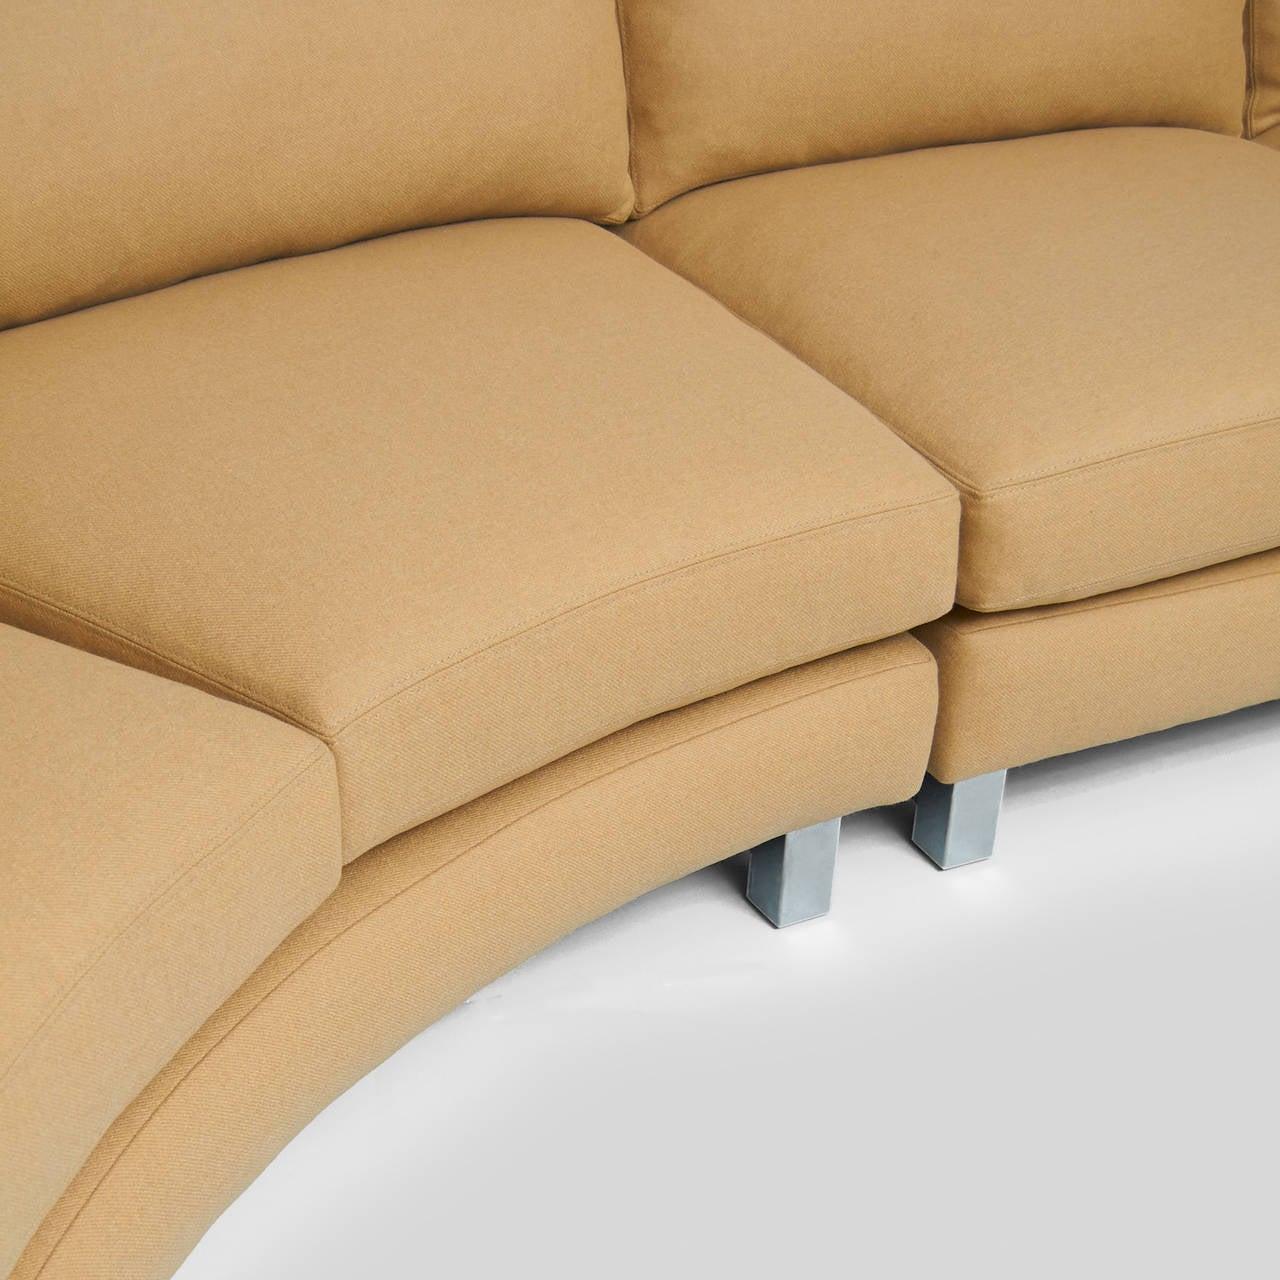 Mid-Century Modern Milo Baughman Sectional Sofa For Sale